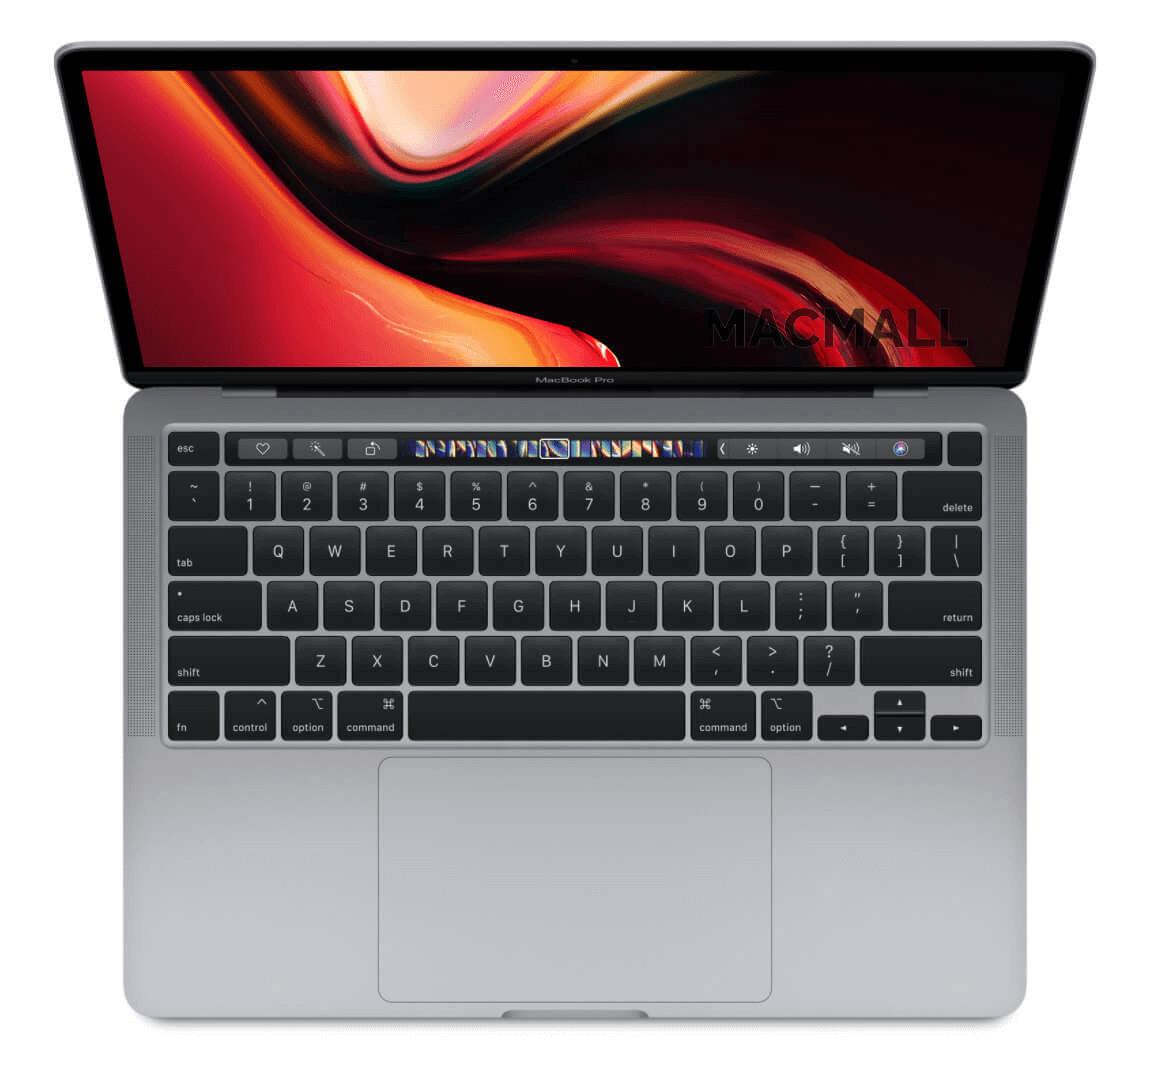 MacBook Pro M1 2020 MYD82 13-inch Space Gray 8GB / 256GB / GPU 8-core